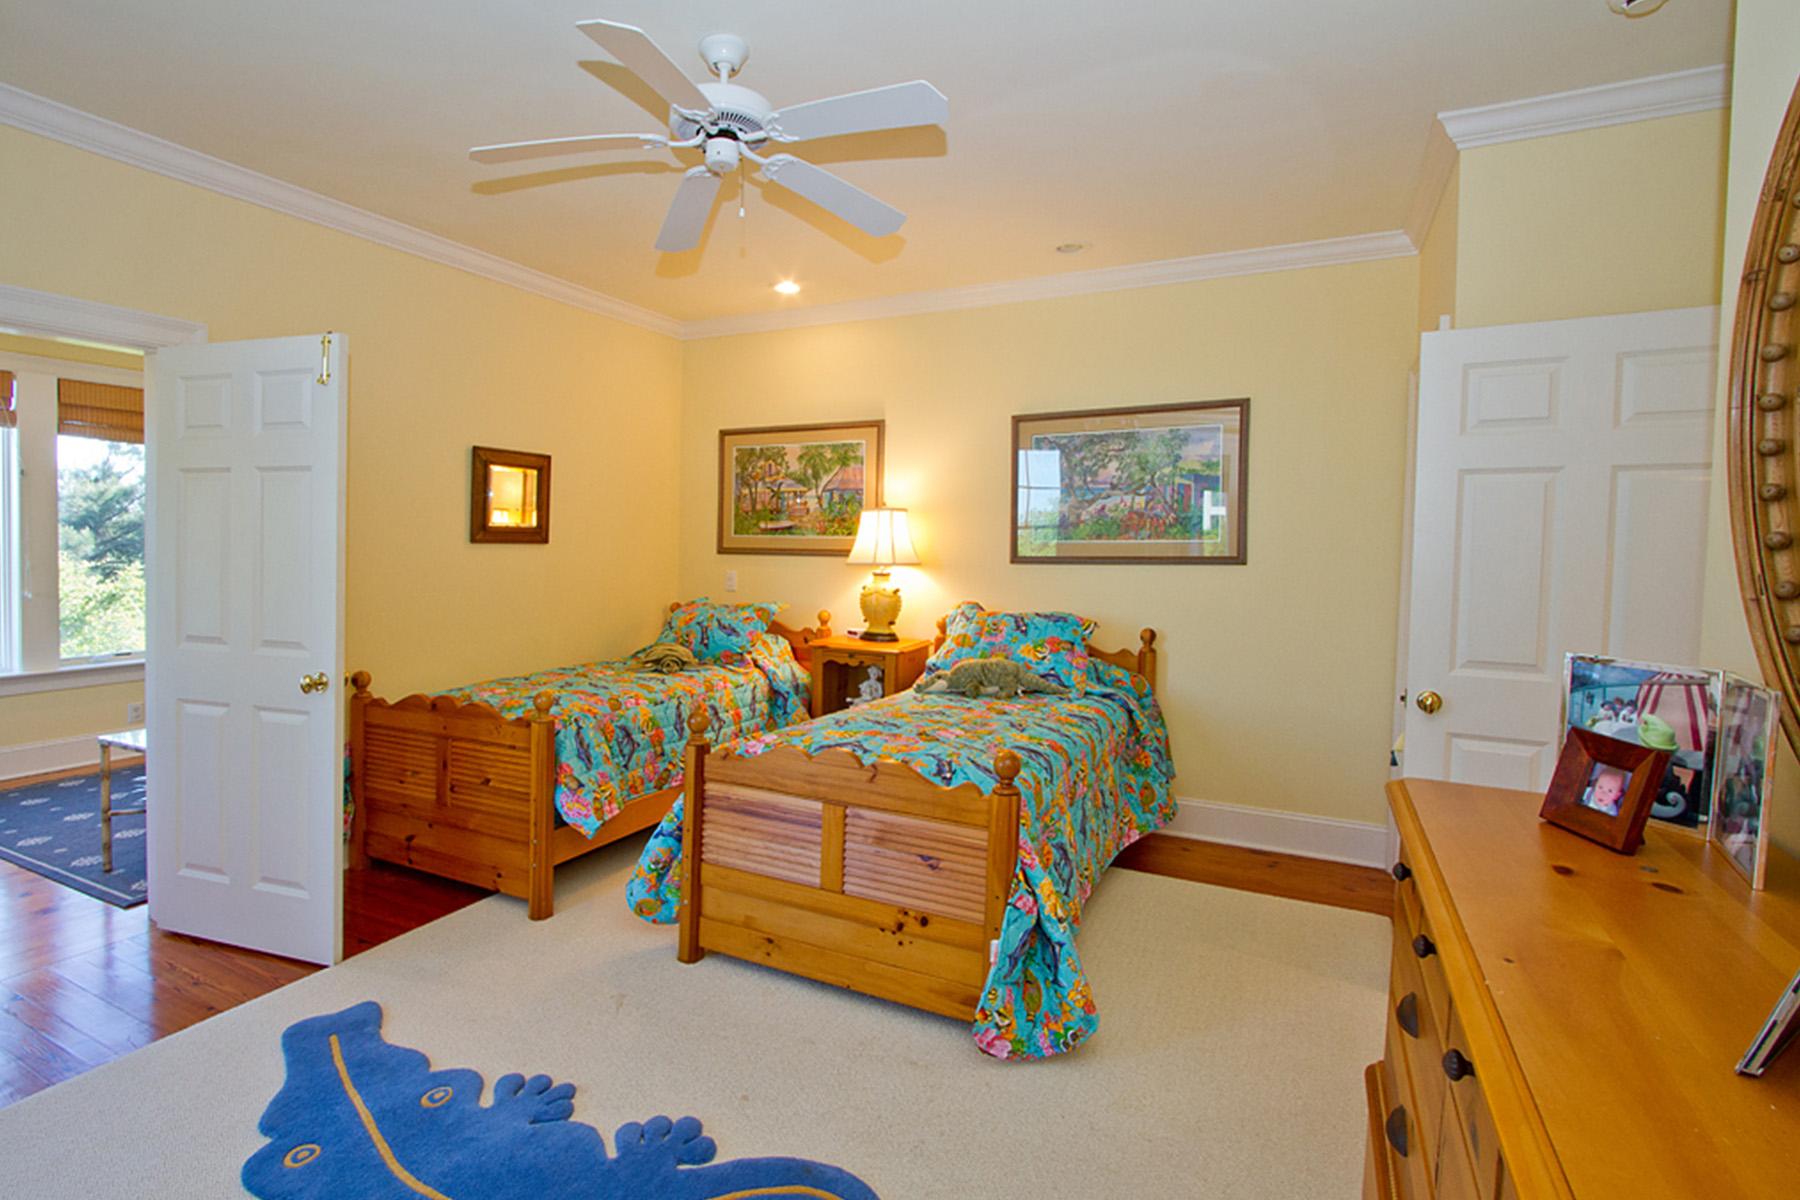 Additional photo for property listing at 12 Eastland Way, Georgetown, SC 29440 12  Eastland Way 乔治城, 南卡罗来纳州 29440 美国